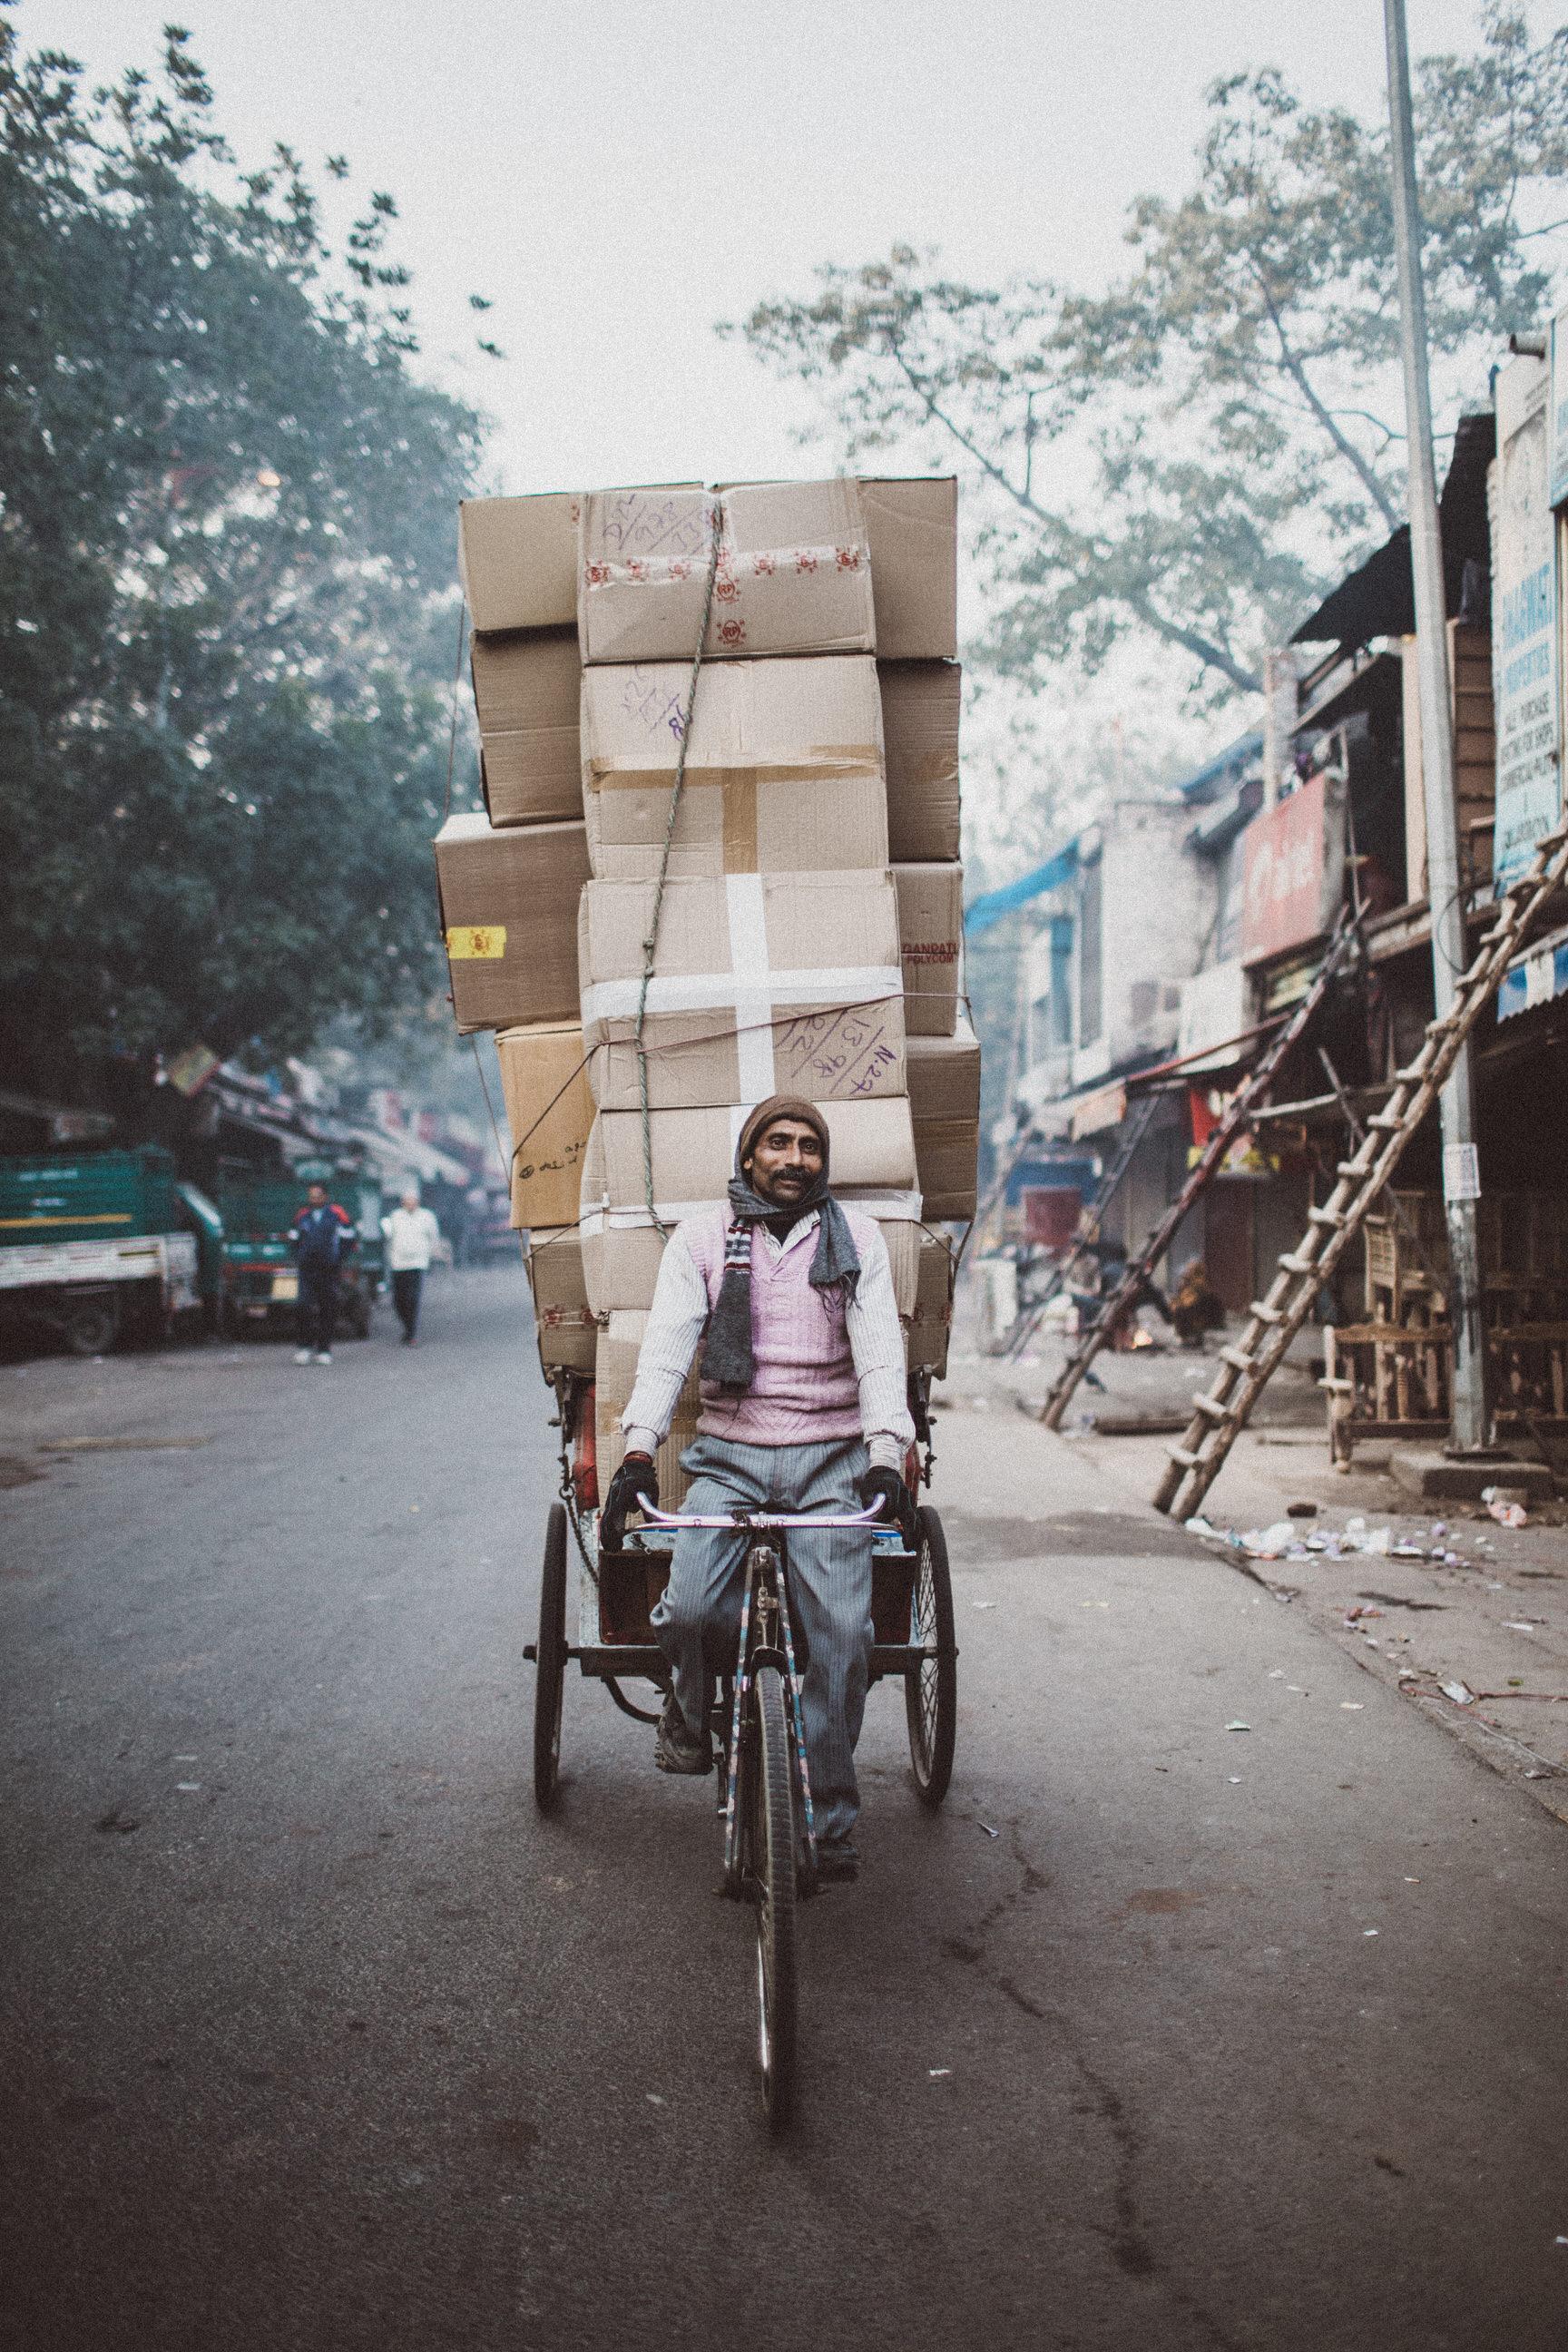 AFFOB_INDIA_20151153.JPG